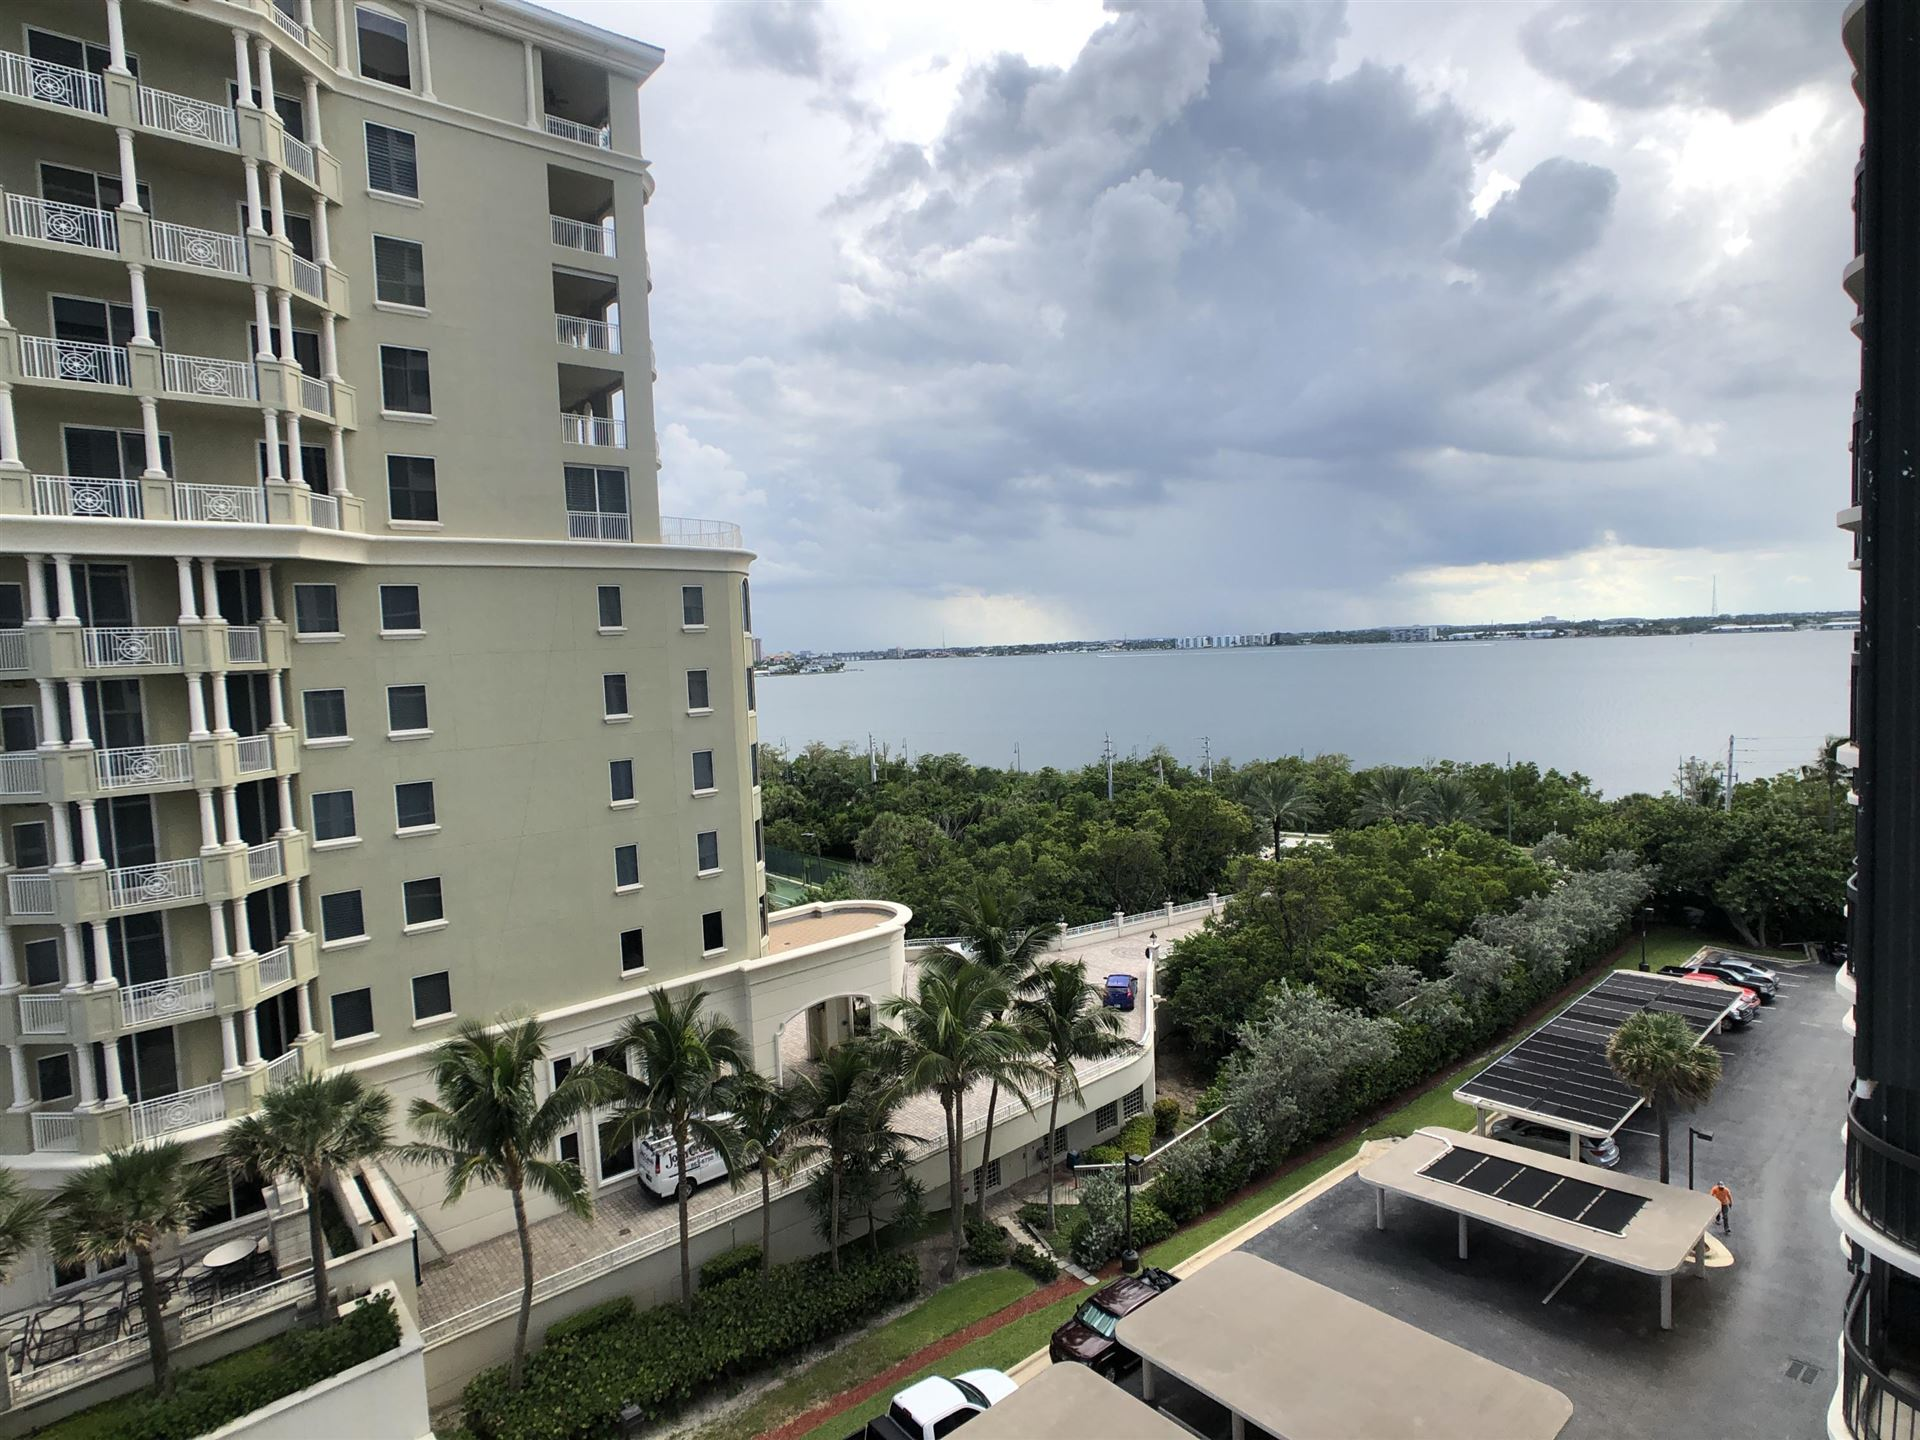 Photo of 5380 N Ocean Drive #8c, Riviera Beach, FL 33404 (MLS # RX-10664501)